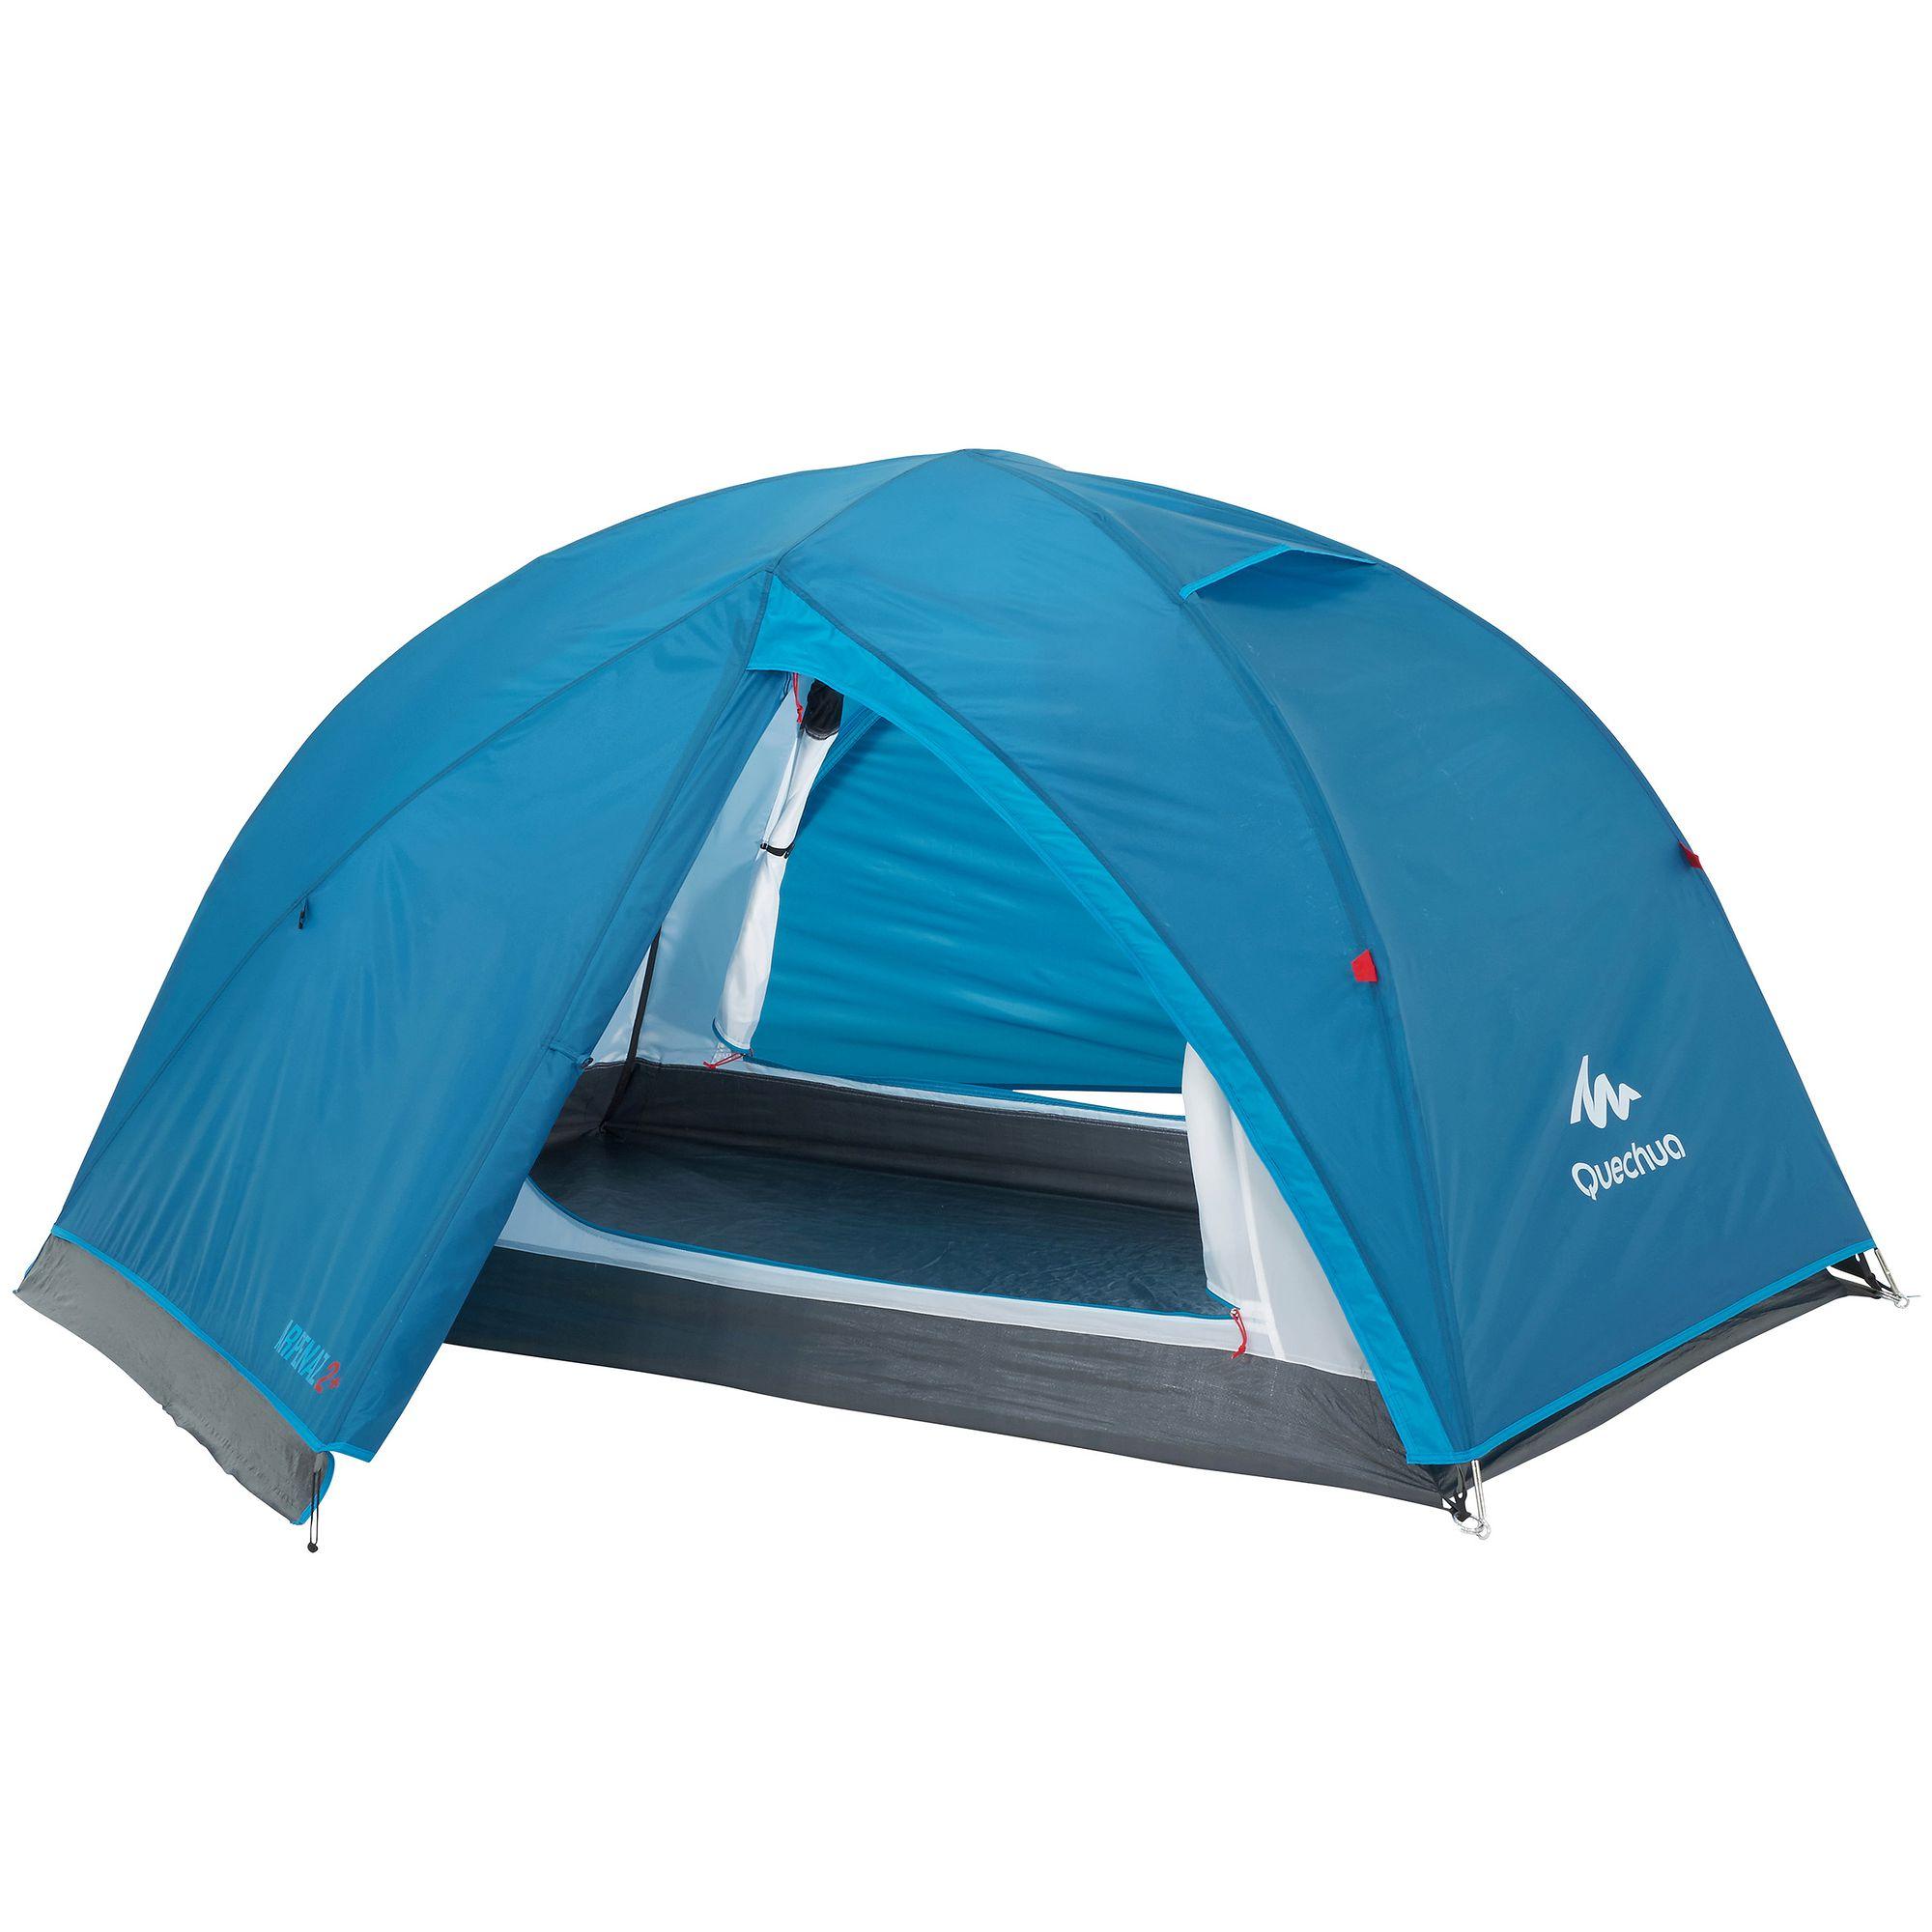 Tente de camping ARPENAZ 2+ | 2 personnes bleu